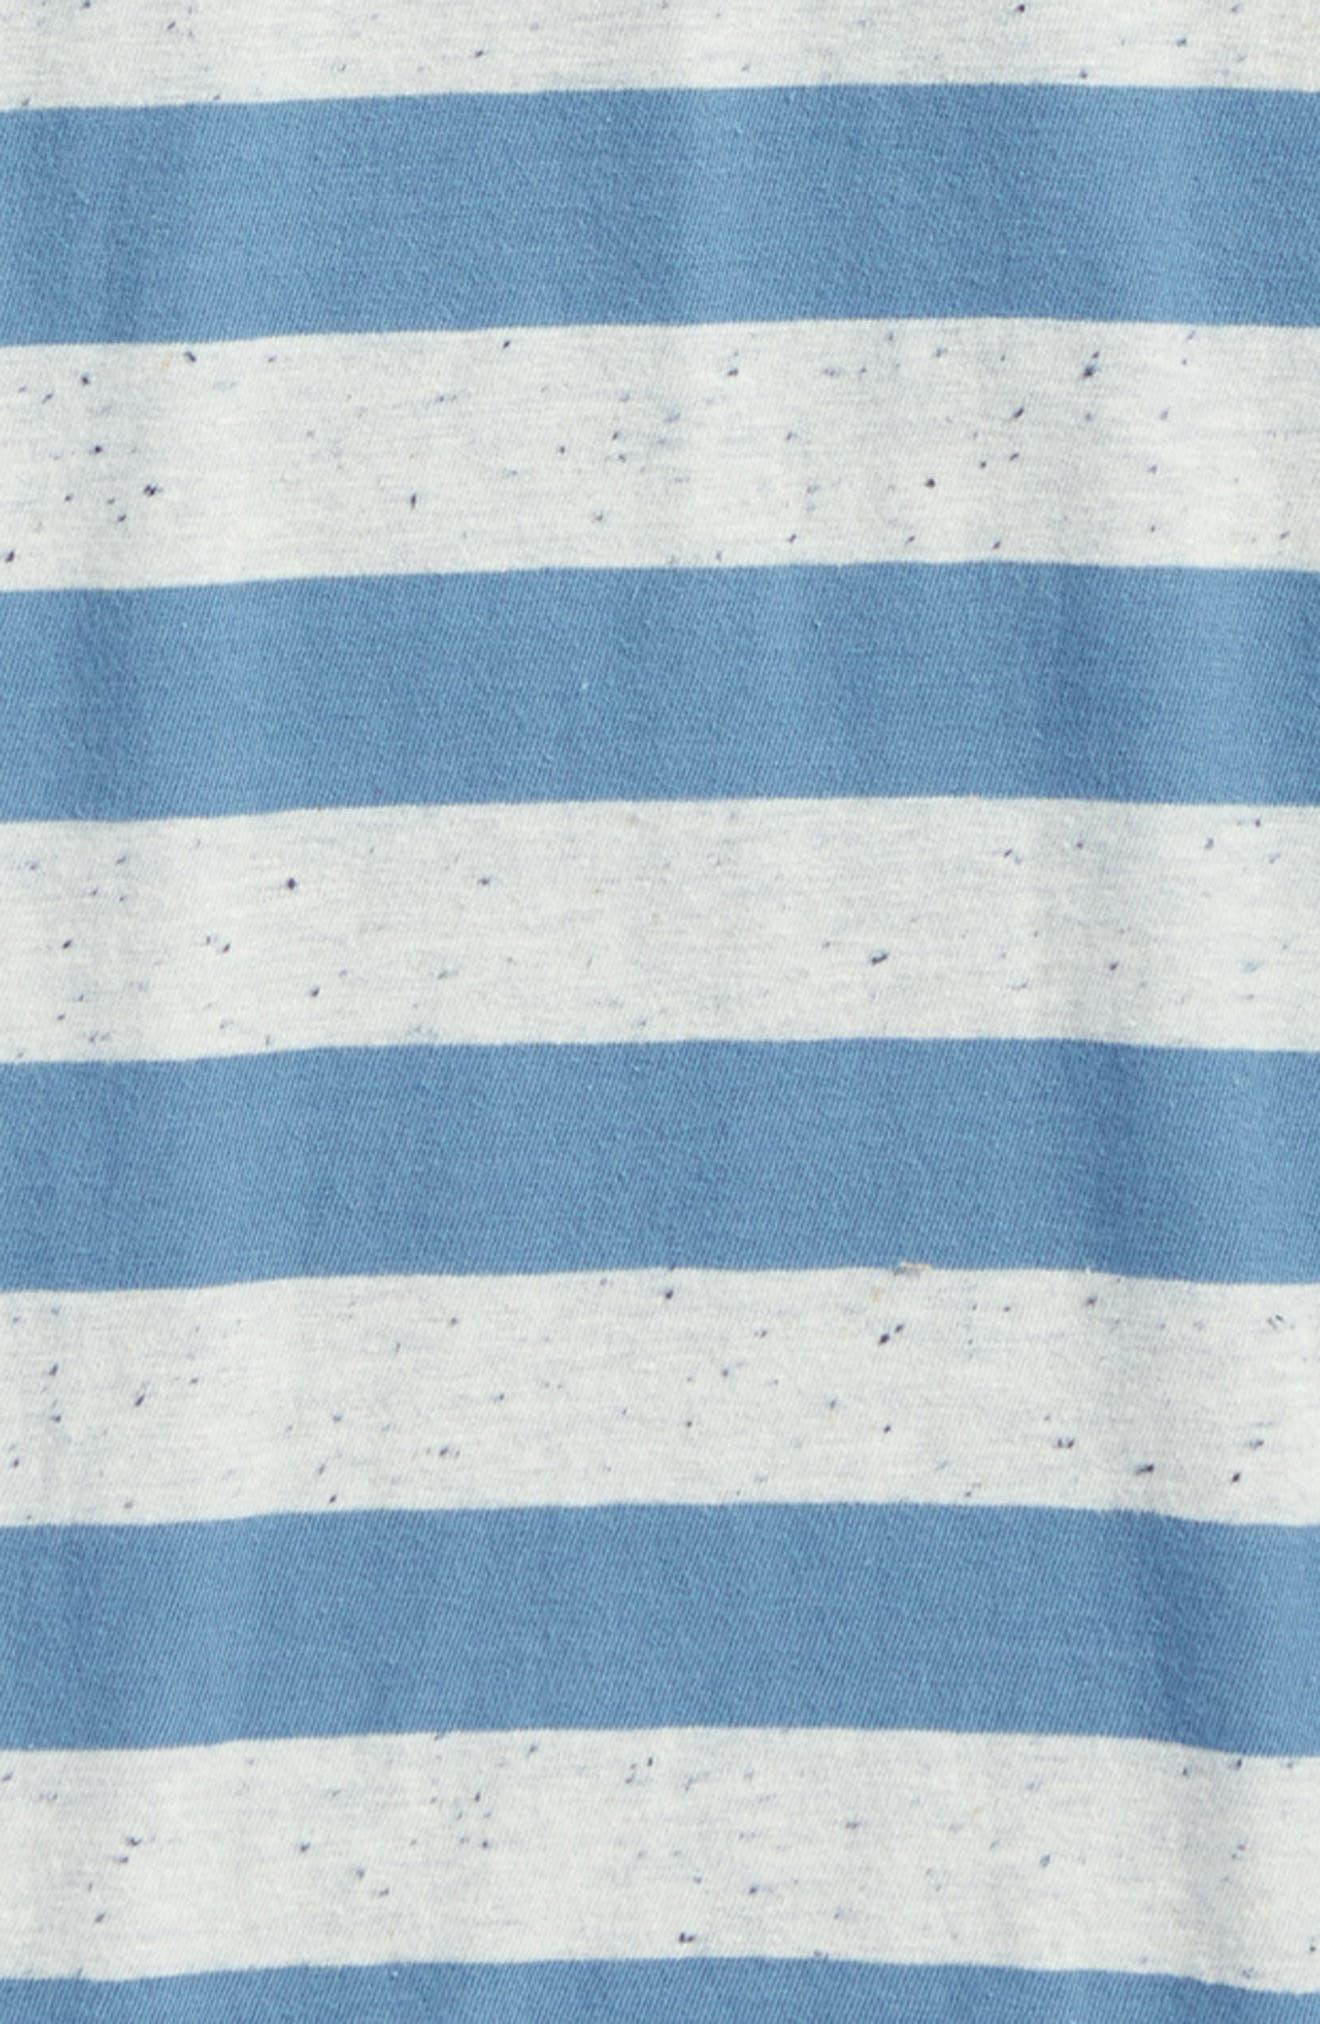 Scoundrel Striped Polo,                             Alternate thumbnail 8, color,